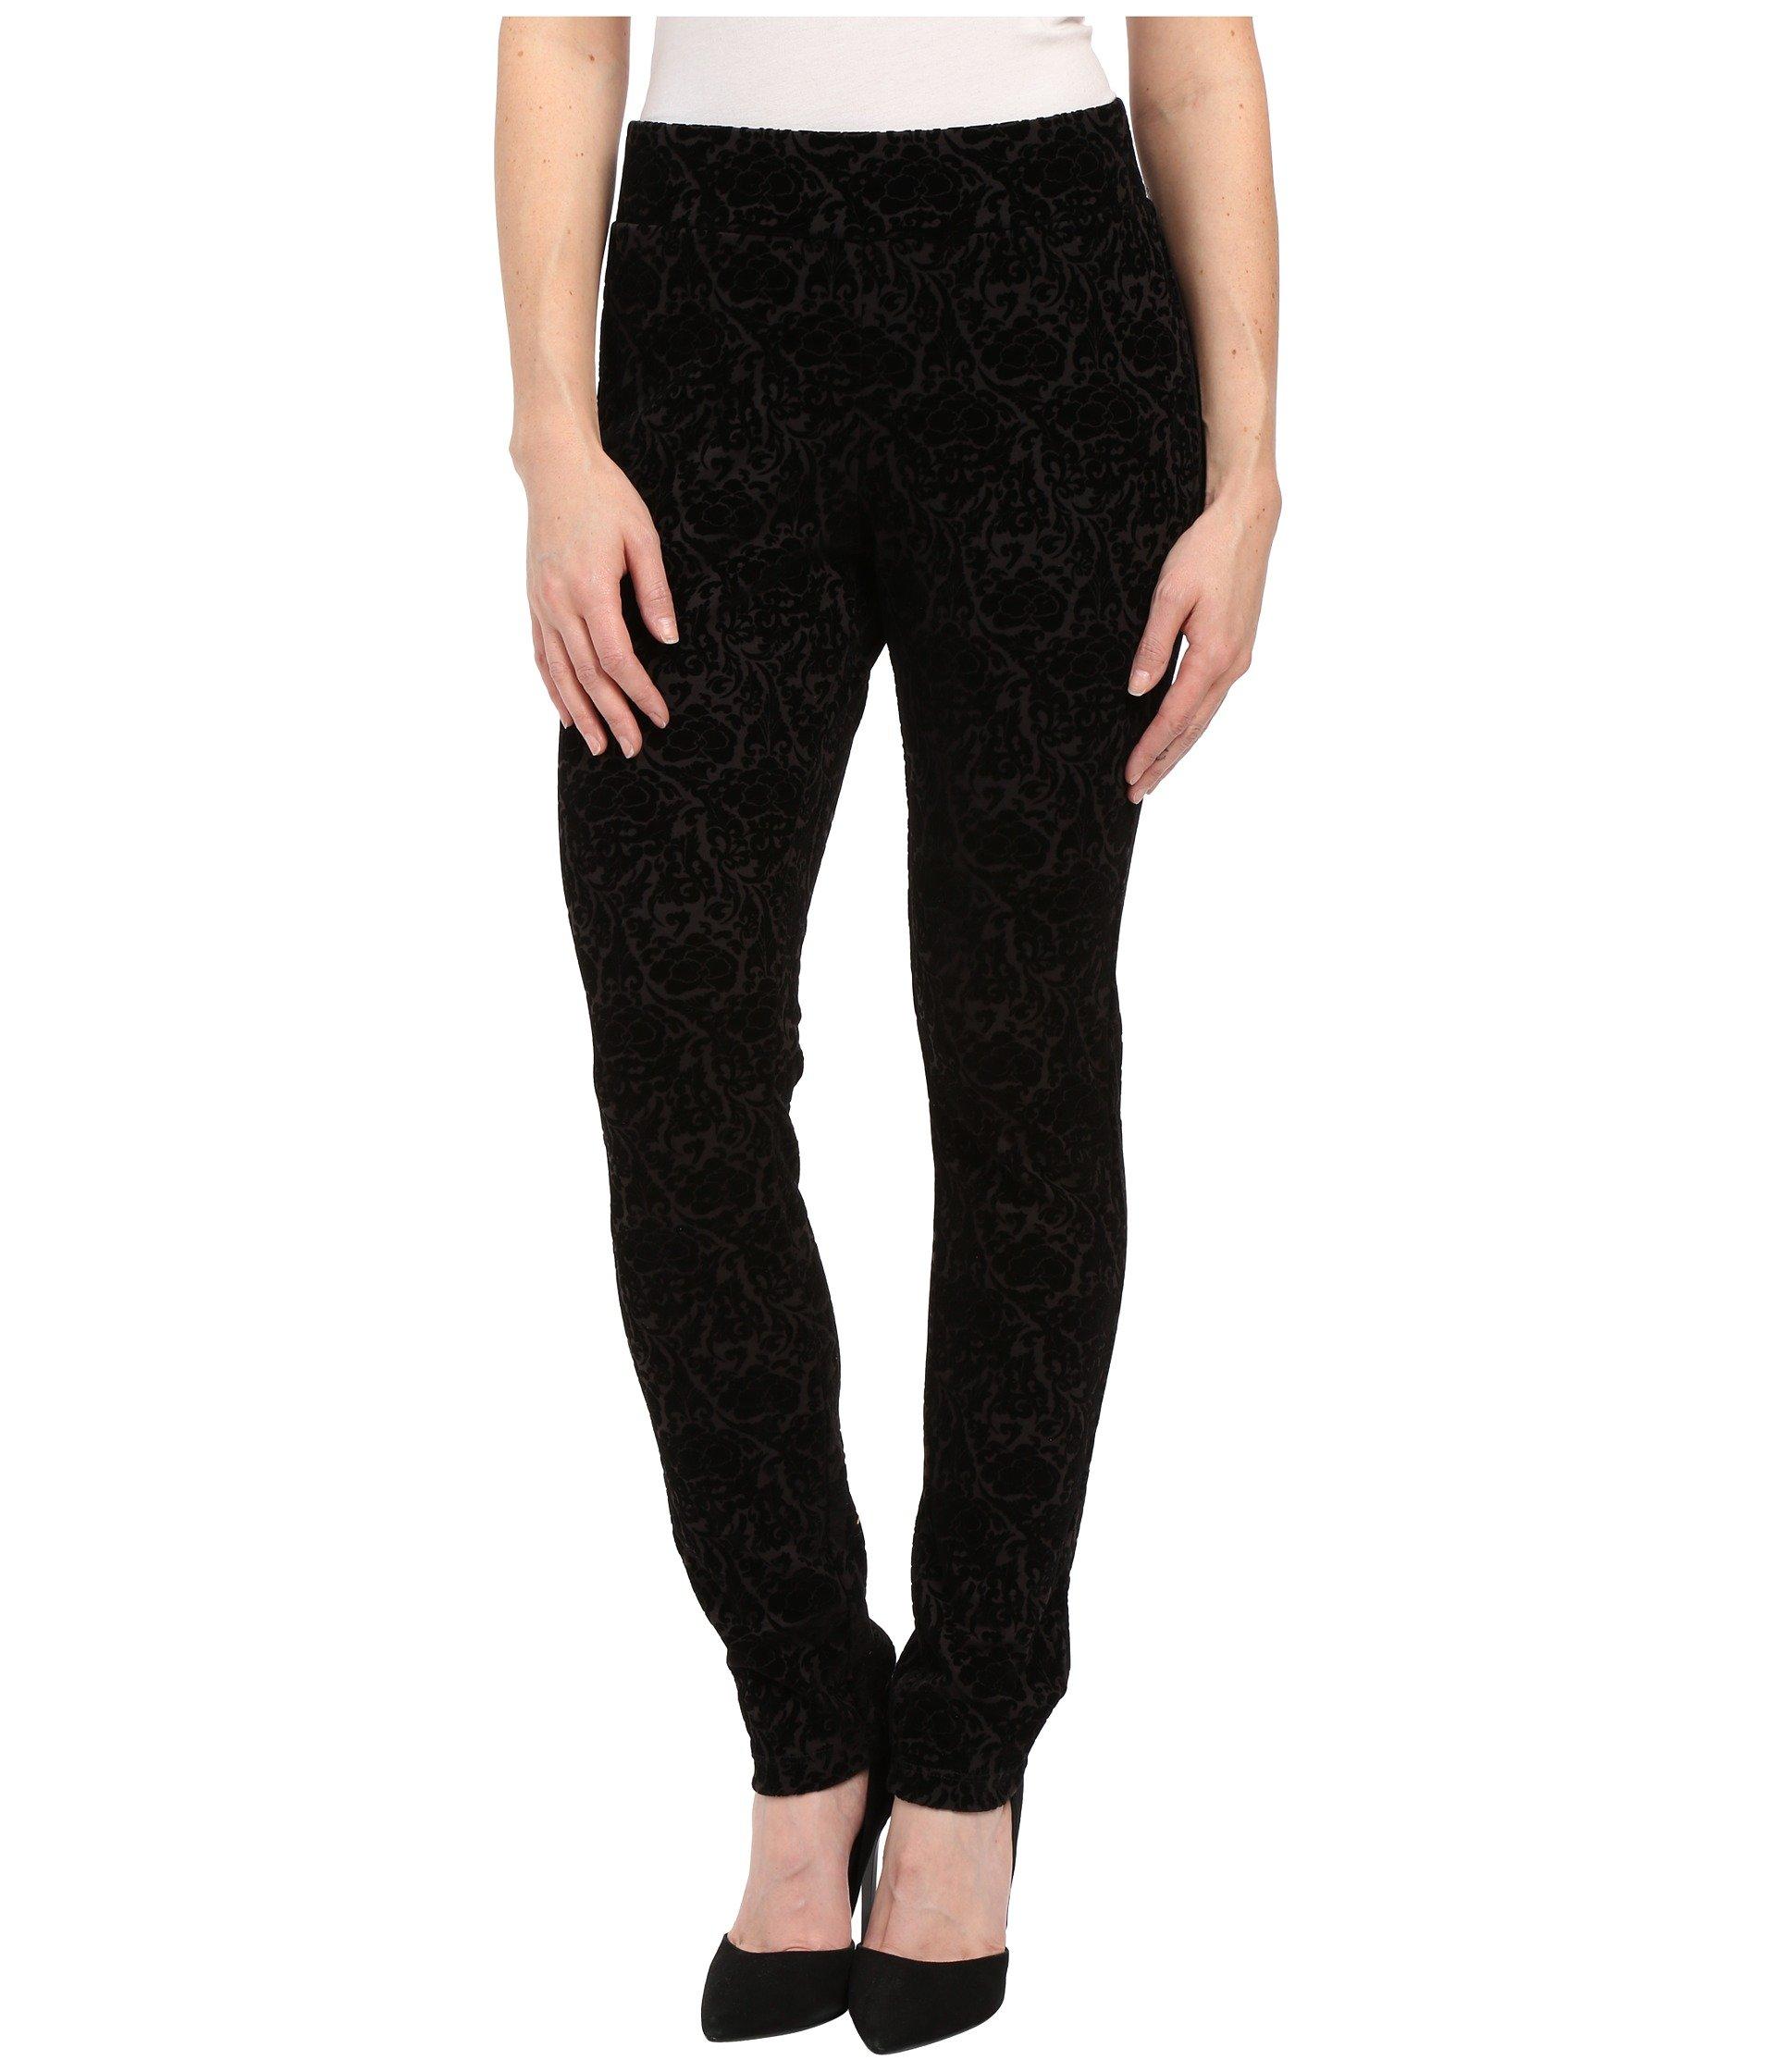 NYDJ Petite Women's Petite Joanie Skinny Pull On Leggings Black Primrose Flocking Pants 18P X 31